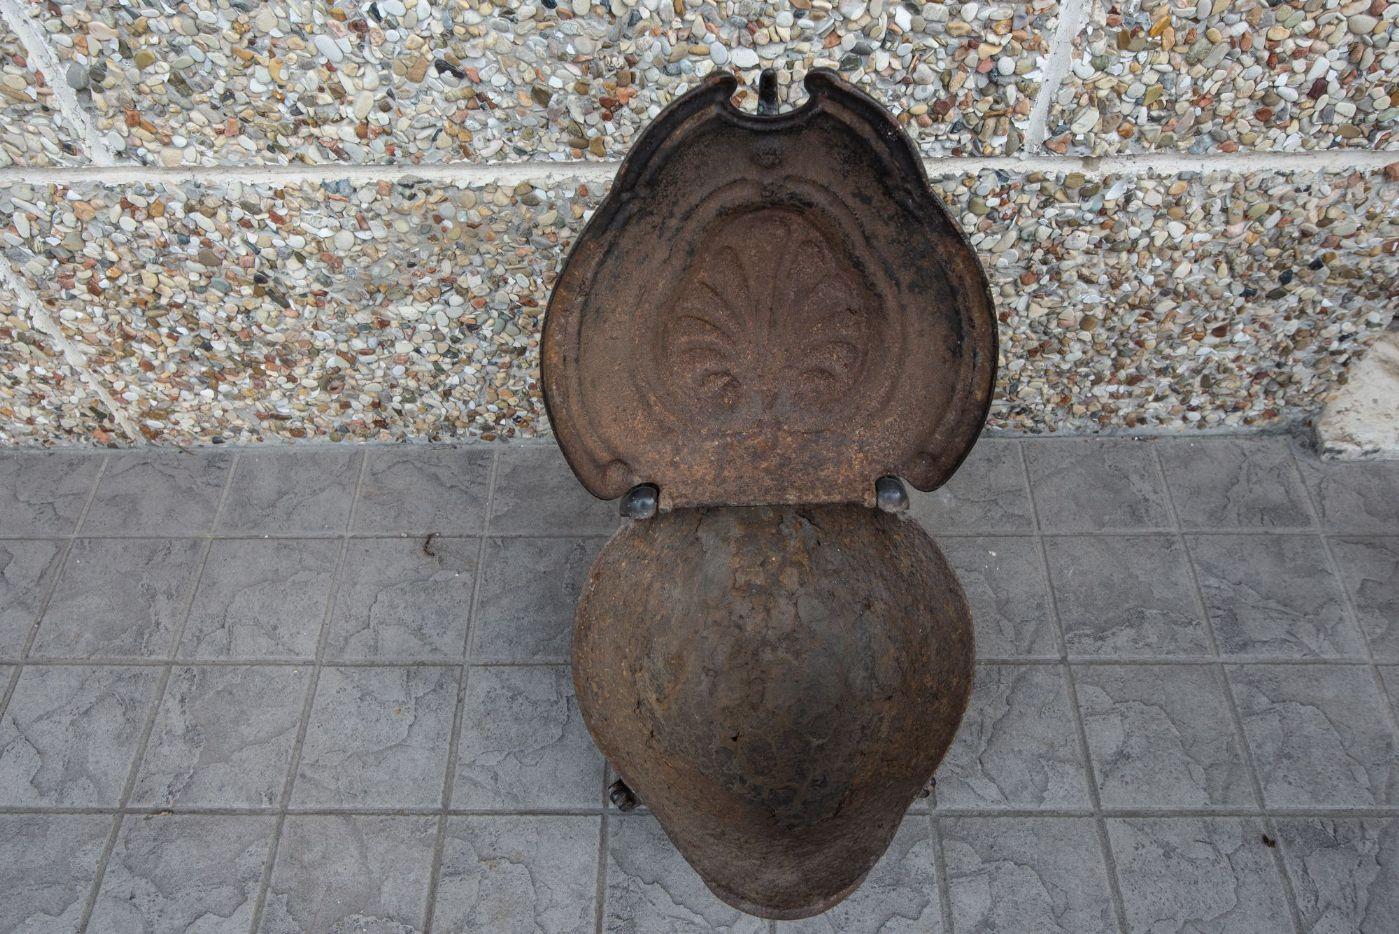 thumb4|Scaldino dell'800 in ghisa  a forma di tartaruga